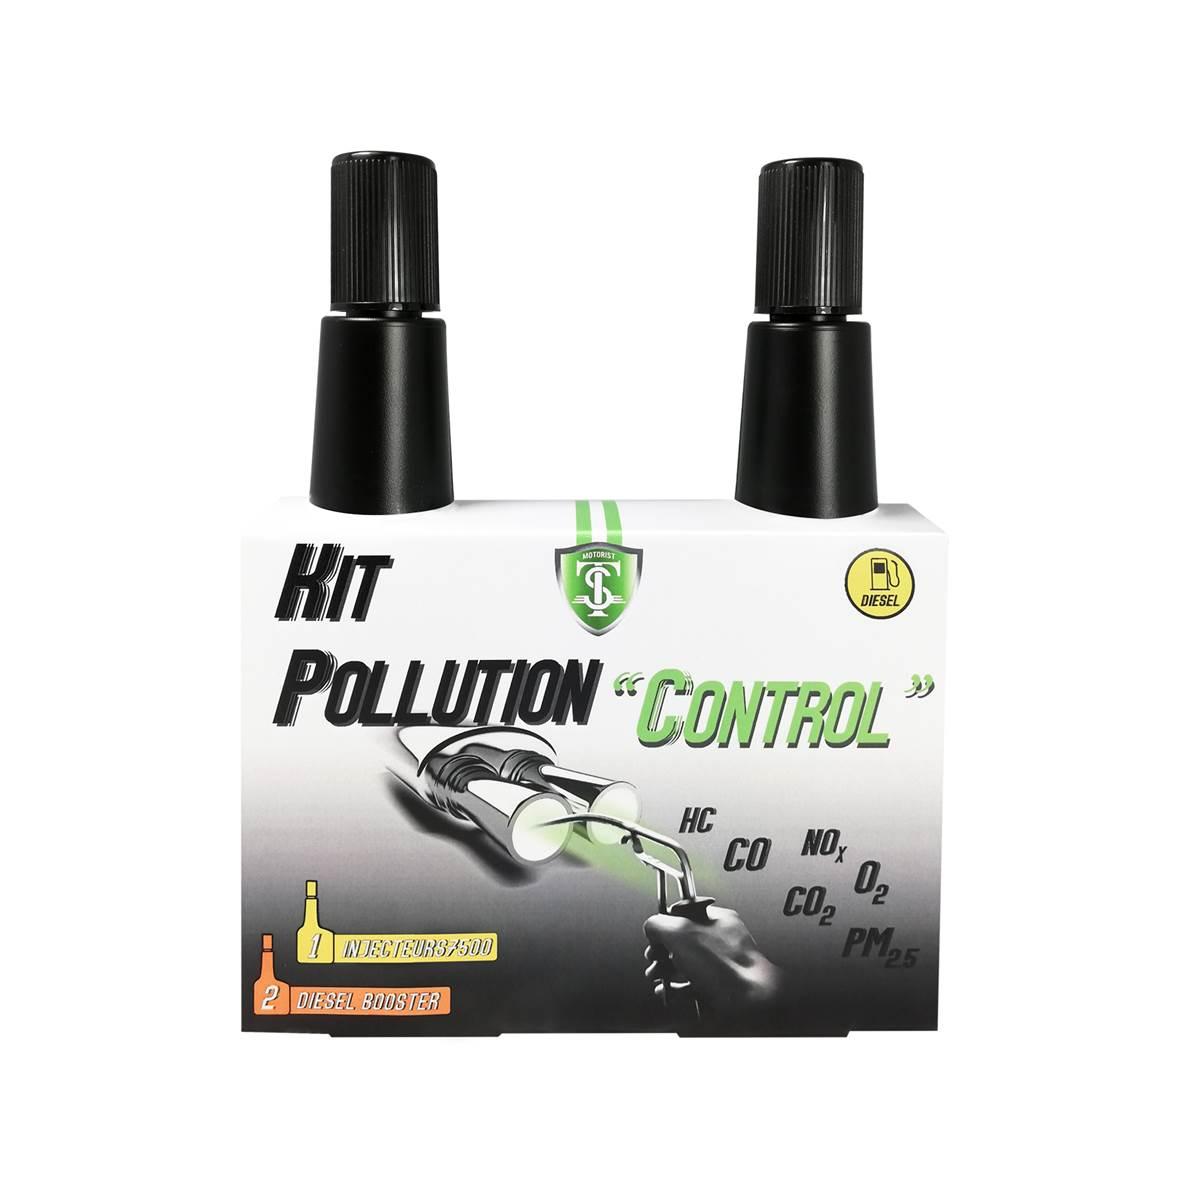 Kit Pollution Control Diesel Spheretech 700 ml